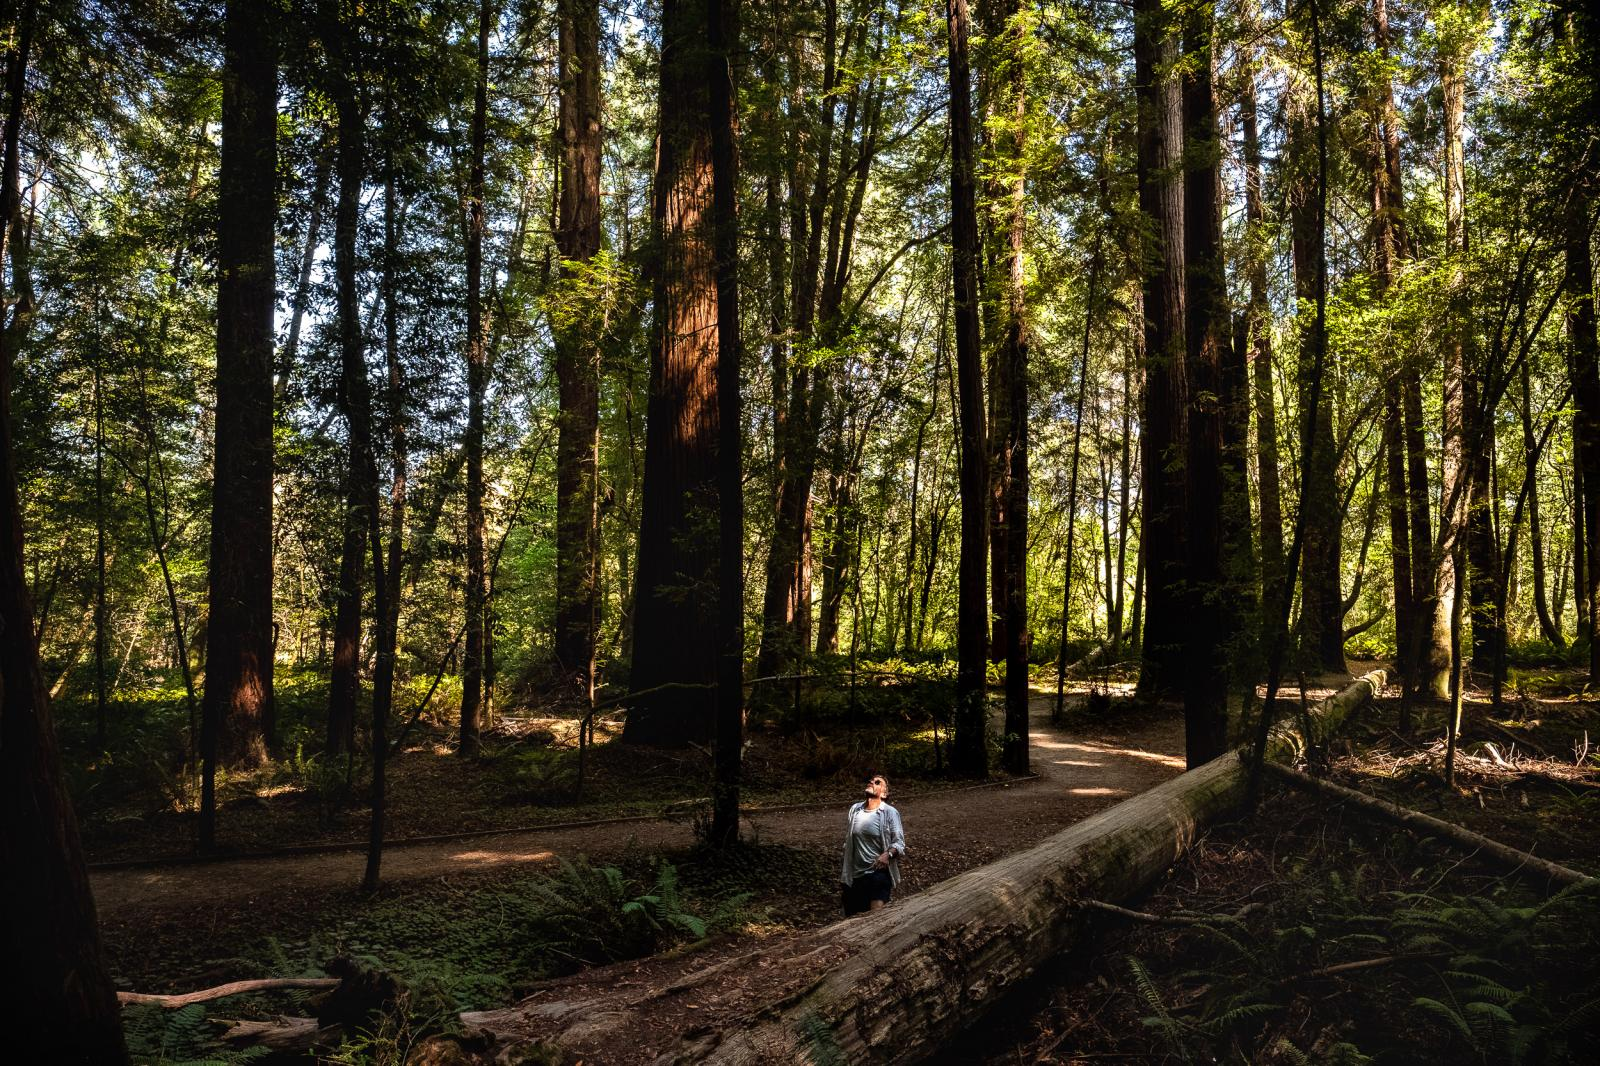 Photography image - Loading __mette_Lampcov-Redwoods-1.jpg